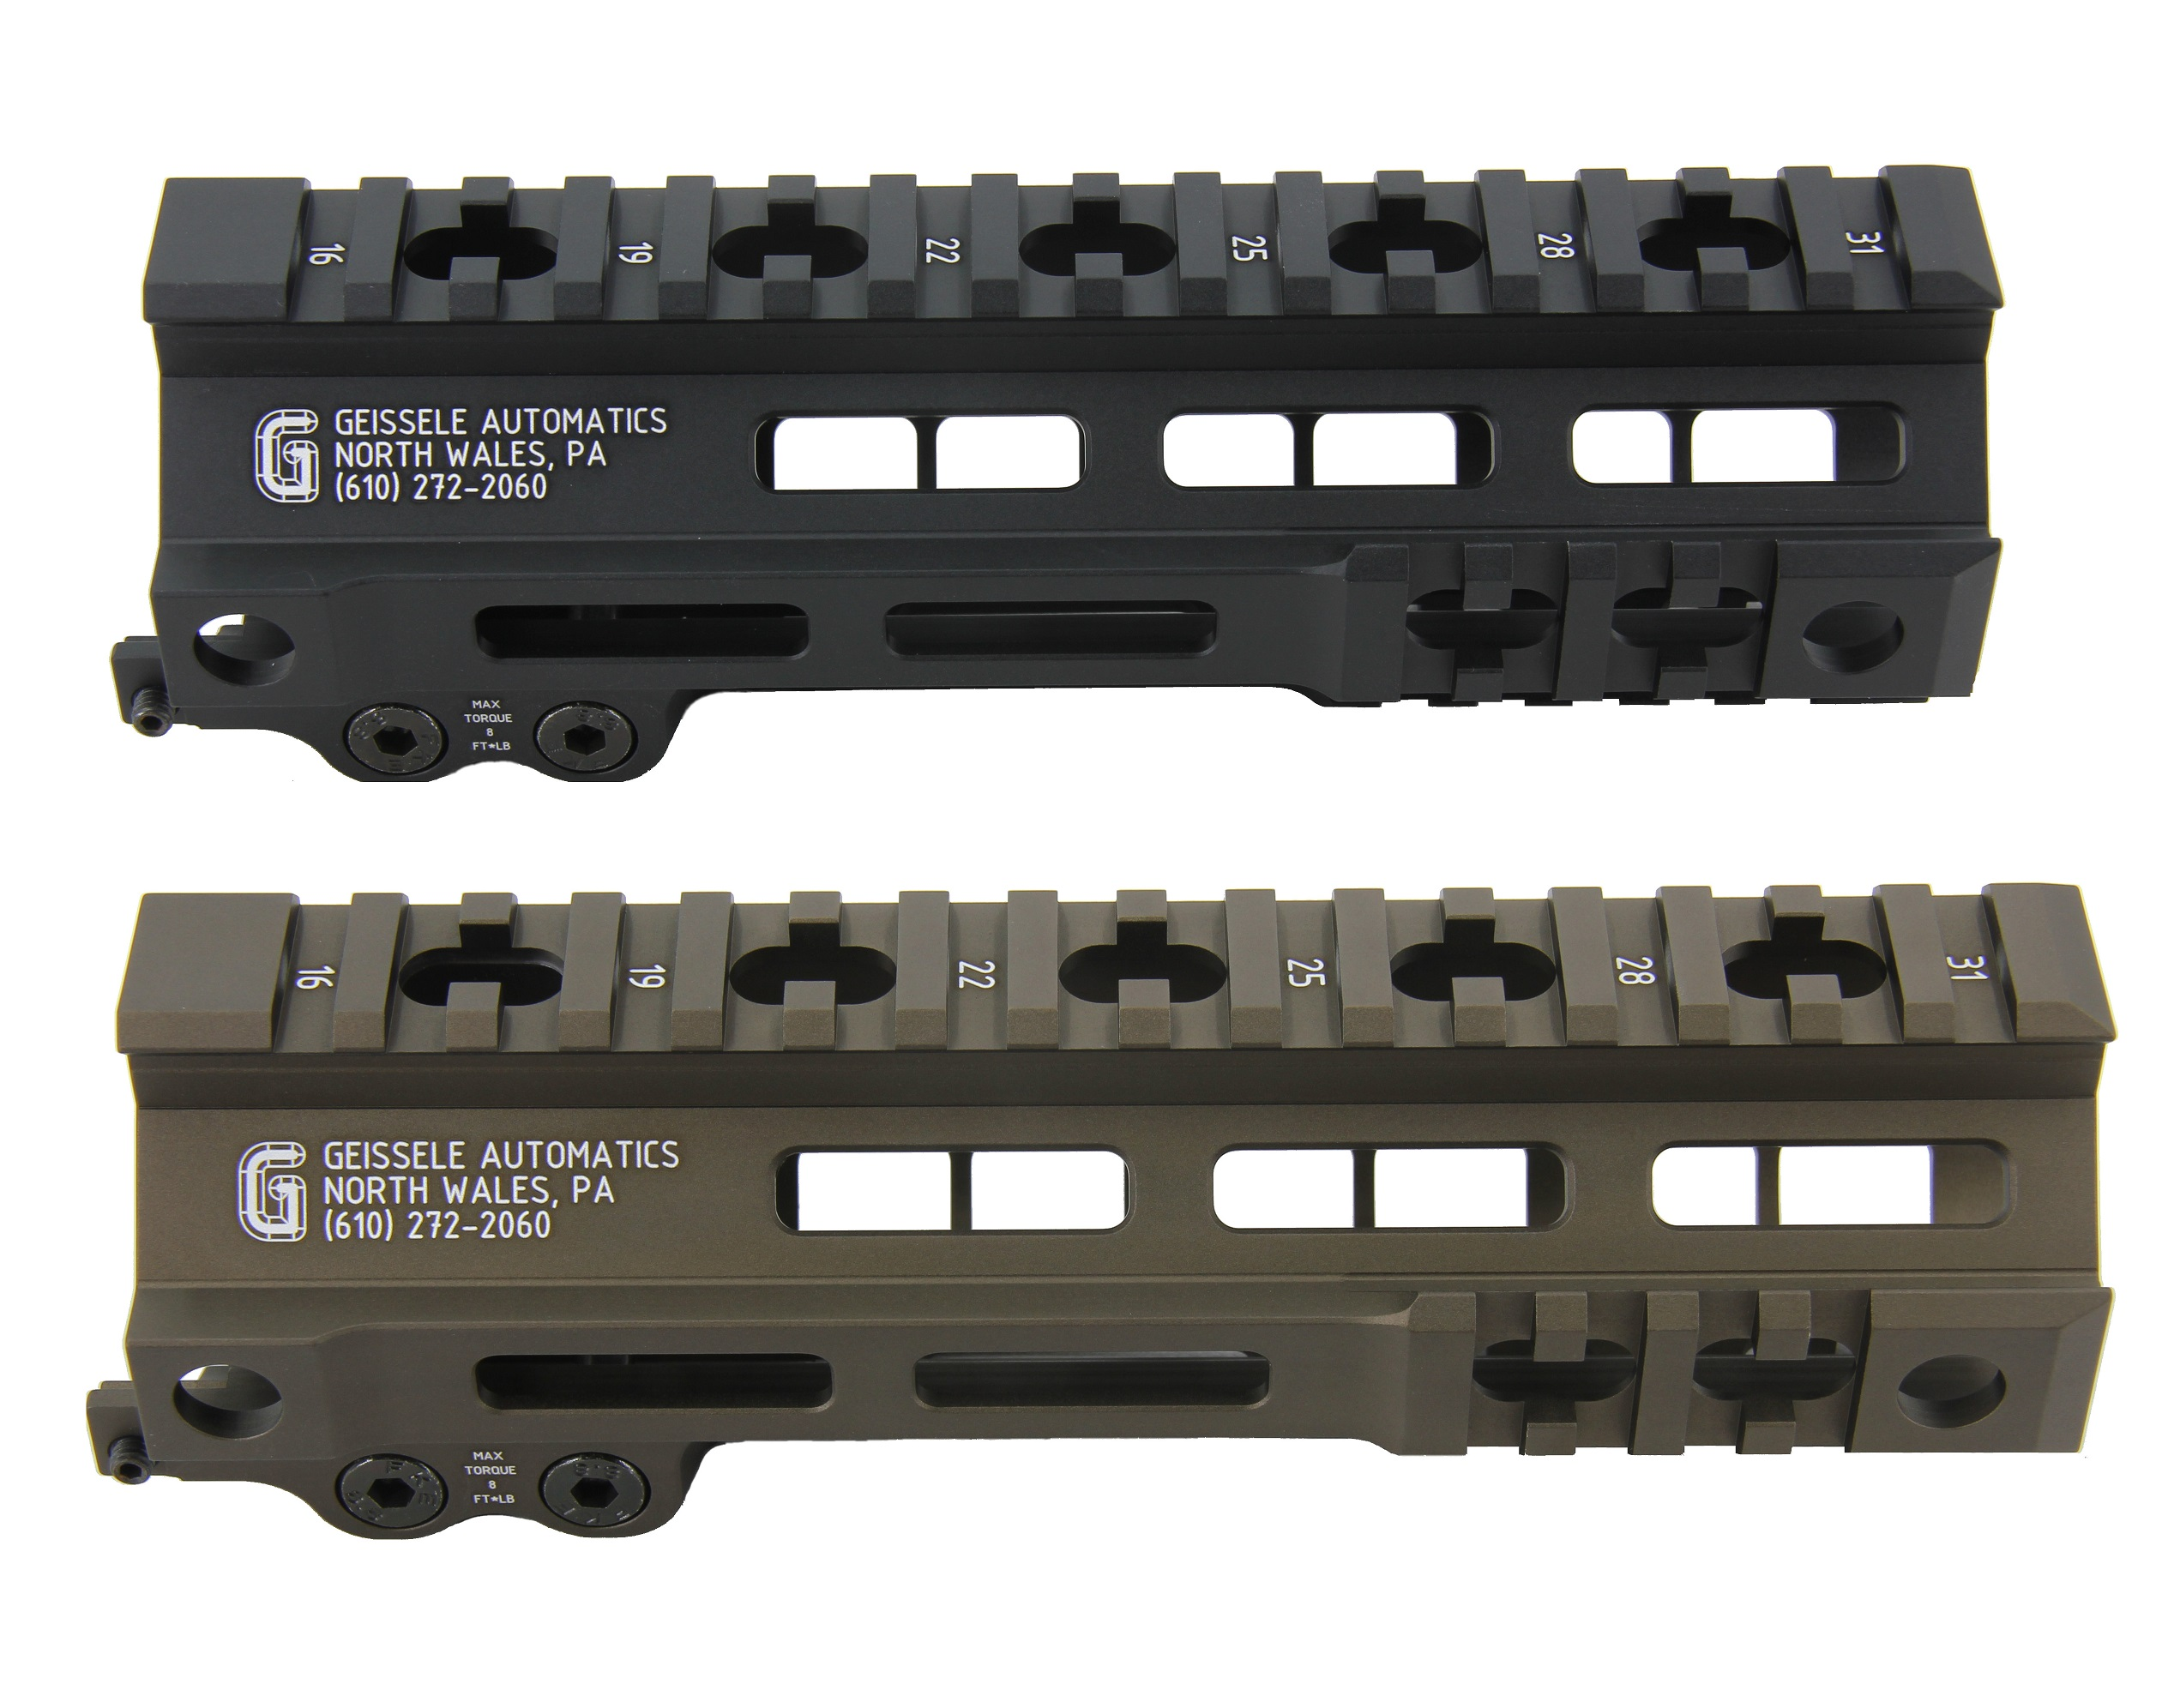 Zparts Geissele MK4タイプ 7'' ハンドガード(MWS/VFC/PTW/GHK/WE対応)